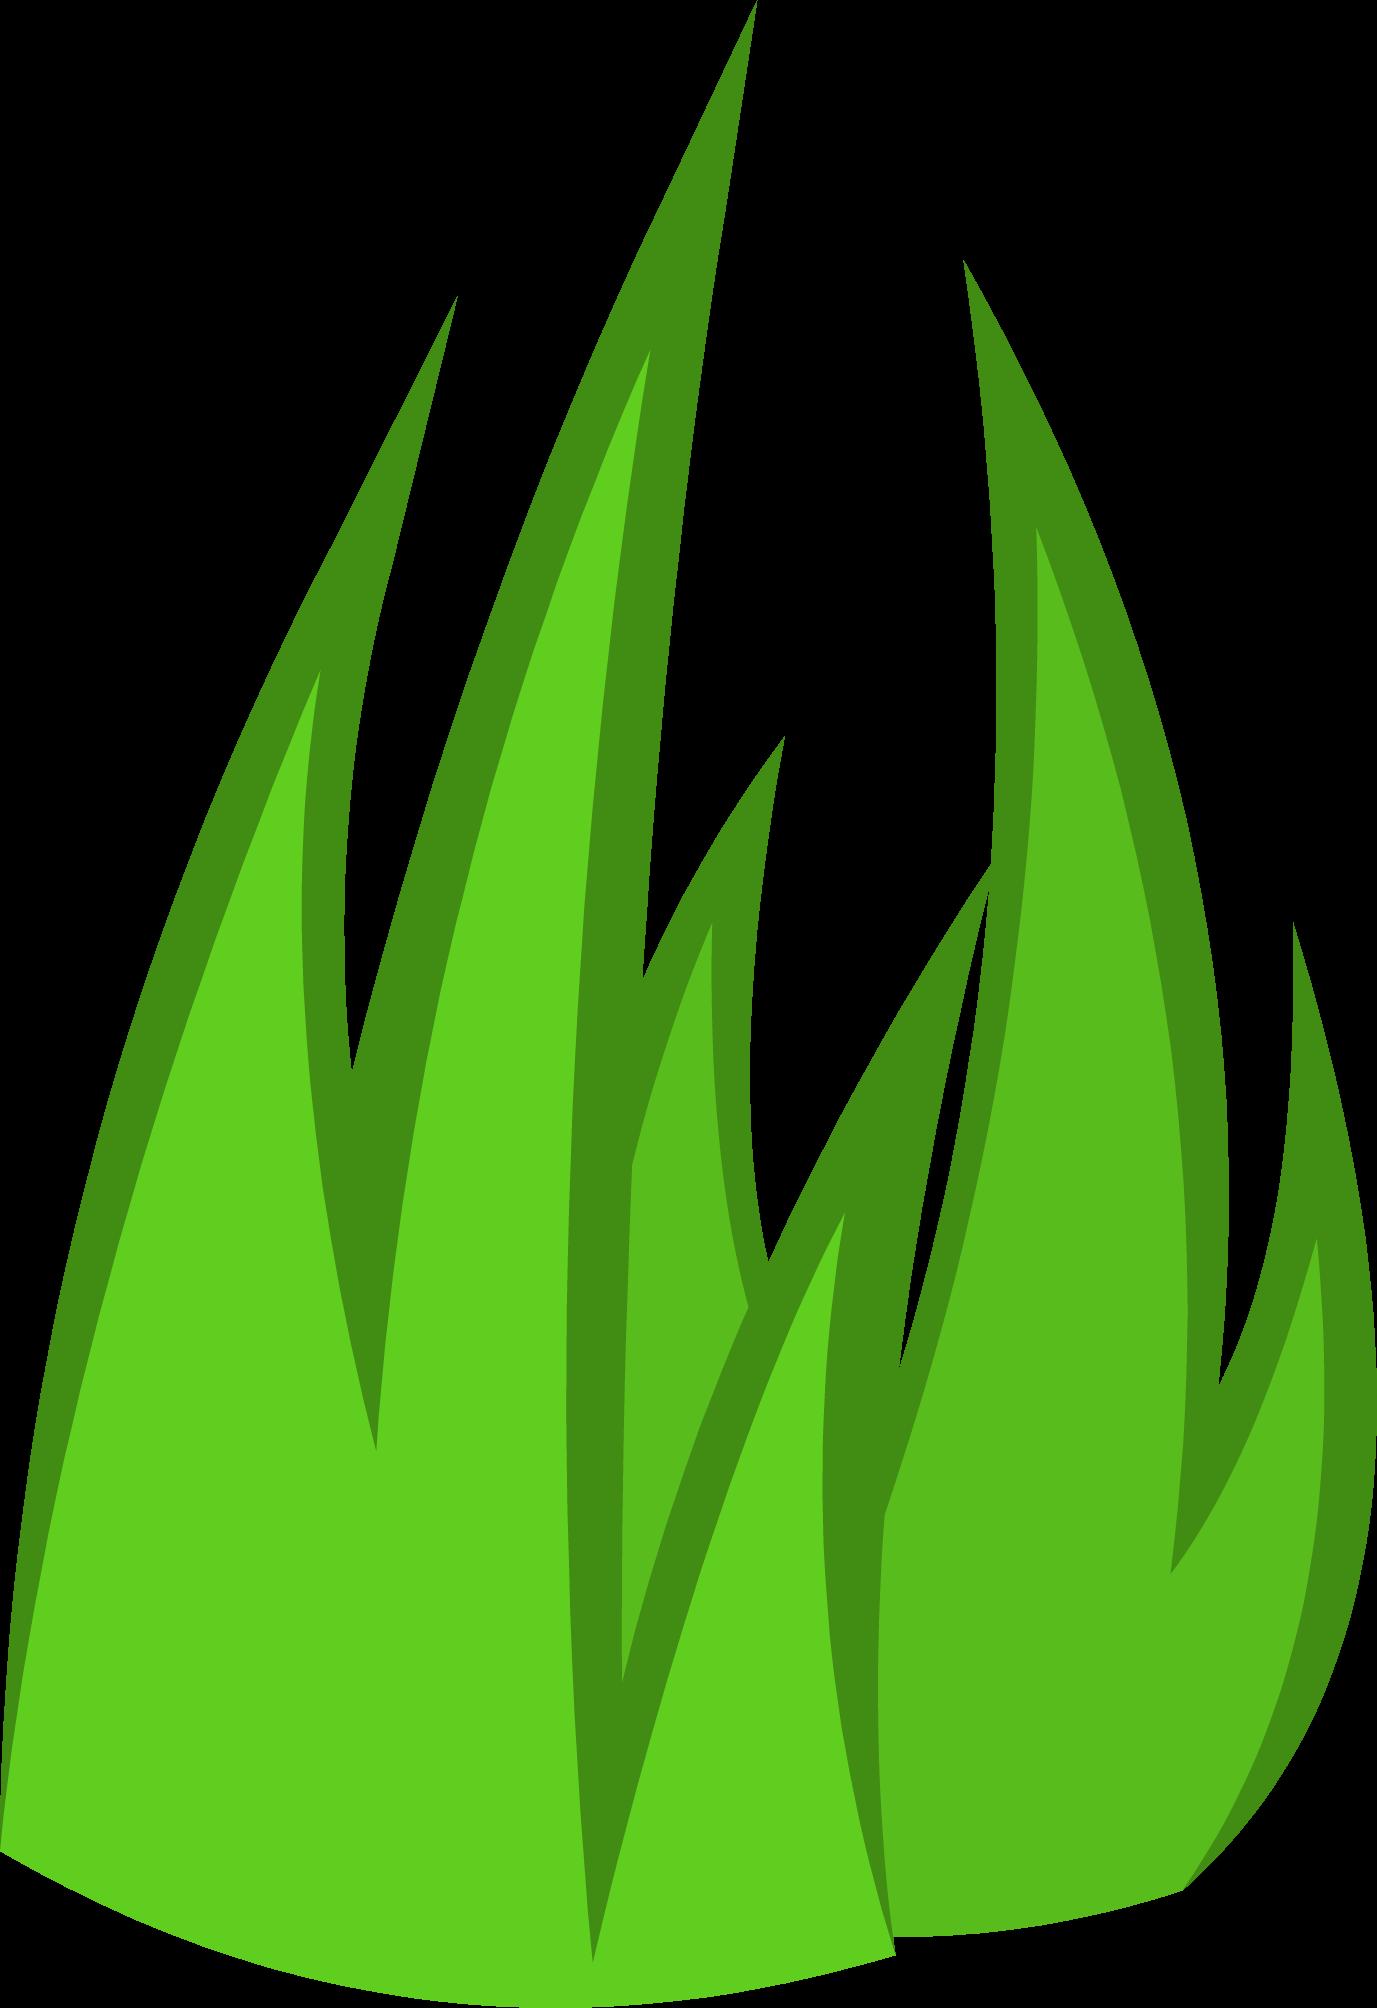 Grassy/Gallery | Battle for Dream Island Wiki | FANDOM powered by Wikia